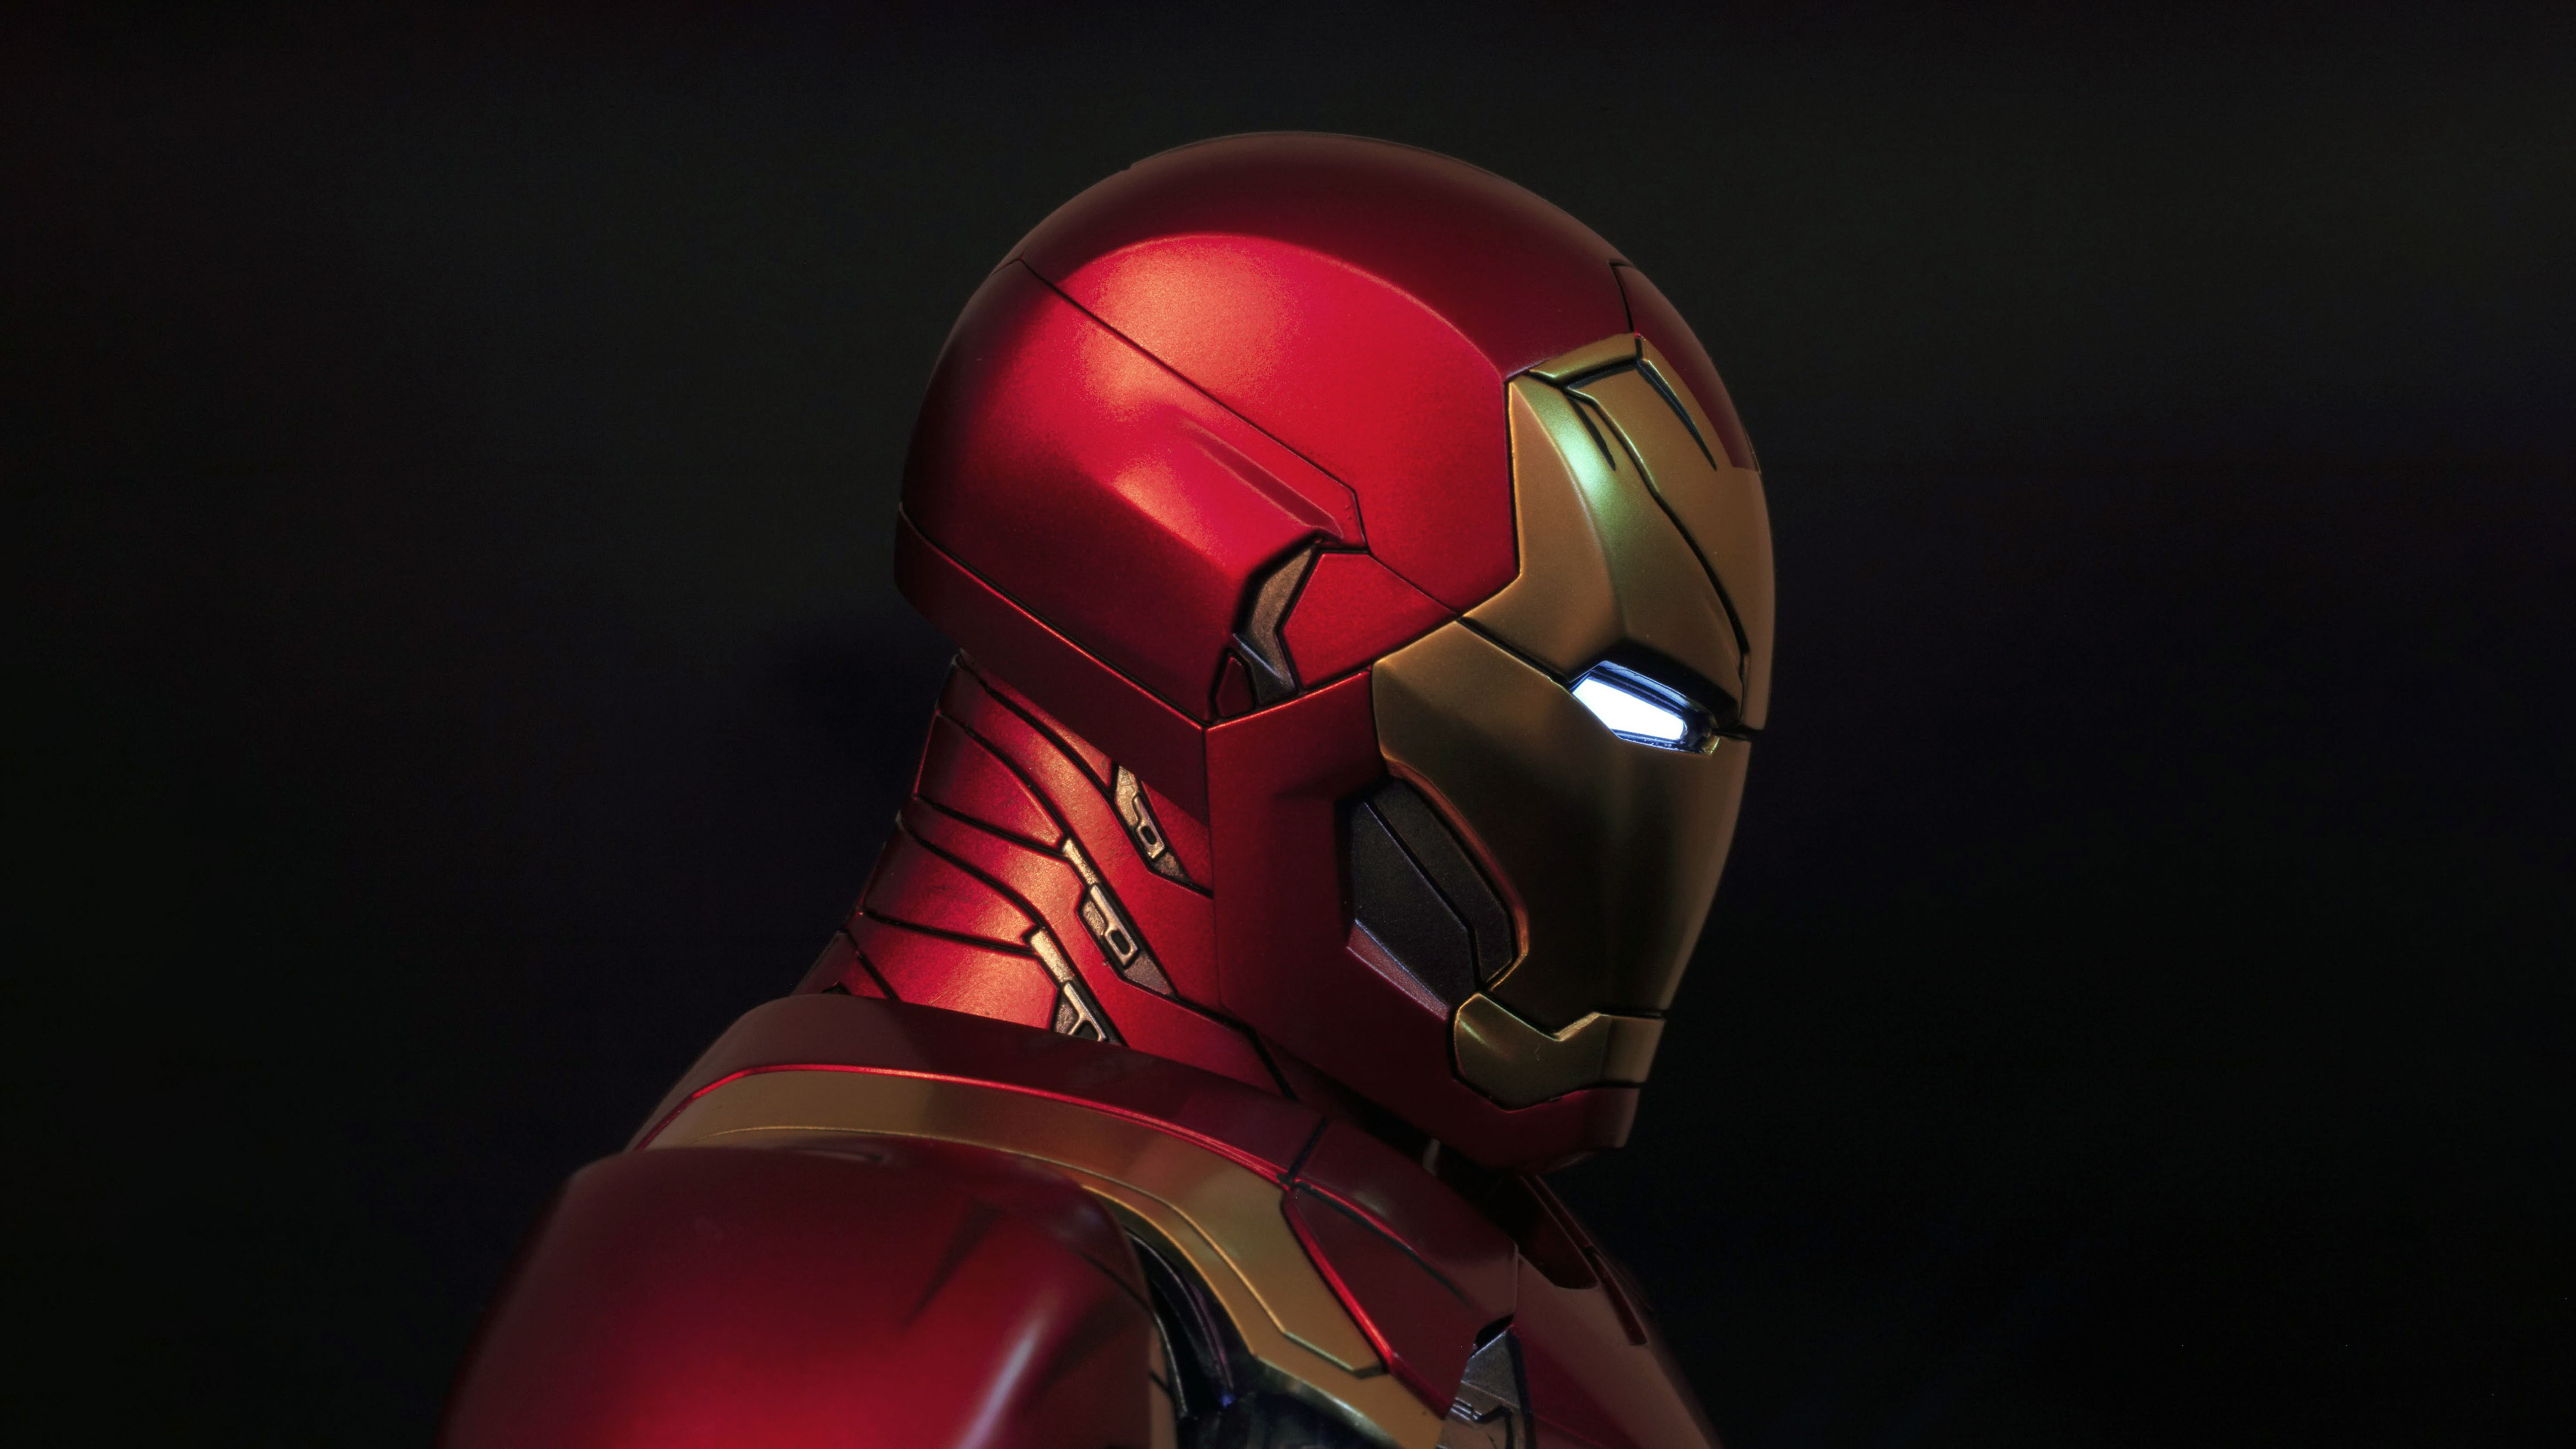 Fondos de pantalla Iron man de perfil